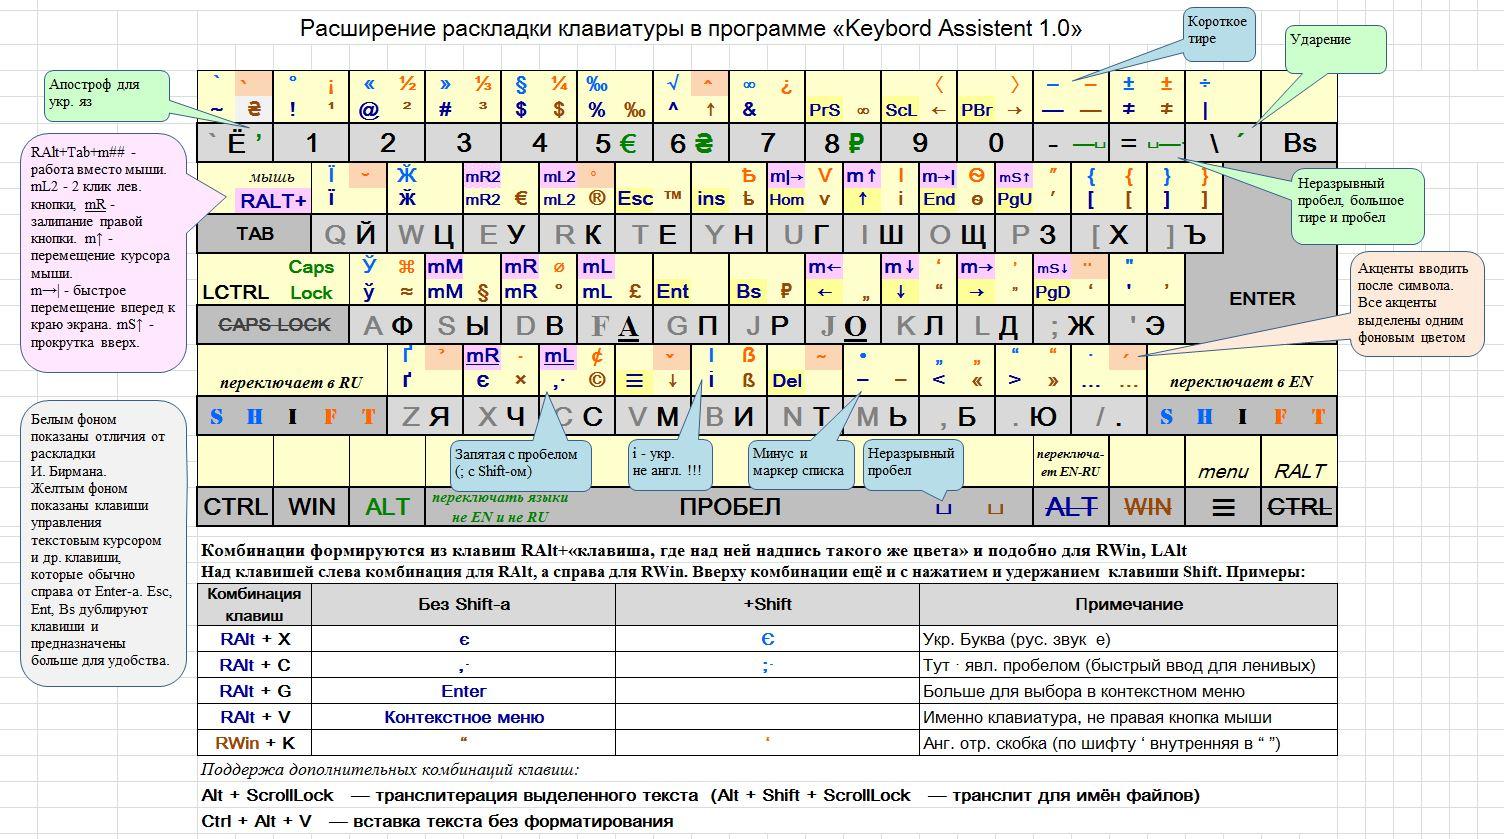 Замена Punto Switcher, раскладки Бирмана с помощью скрипта на autohotkey - 1